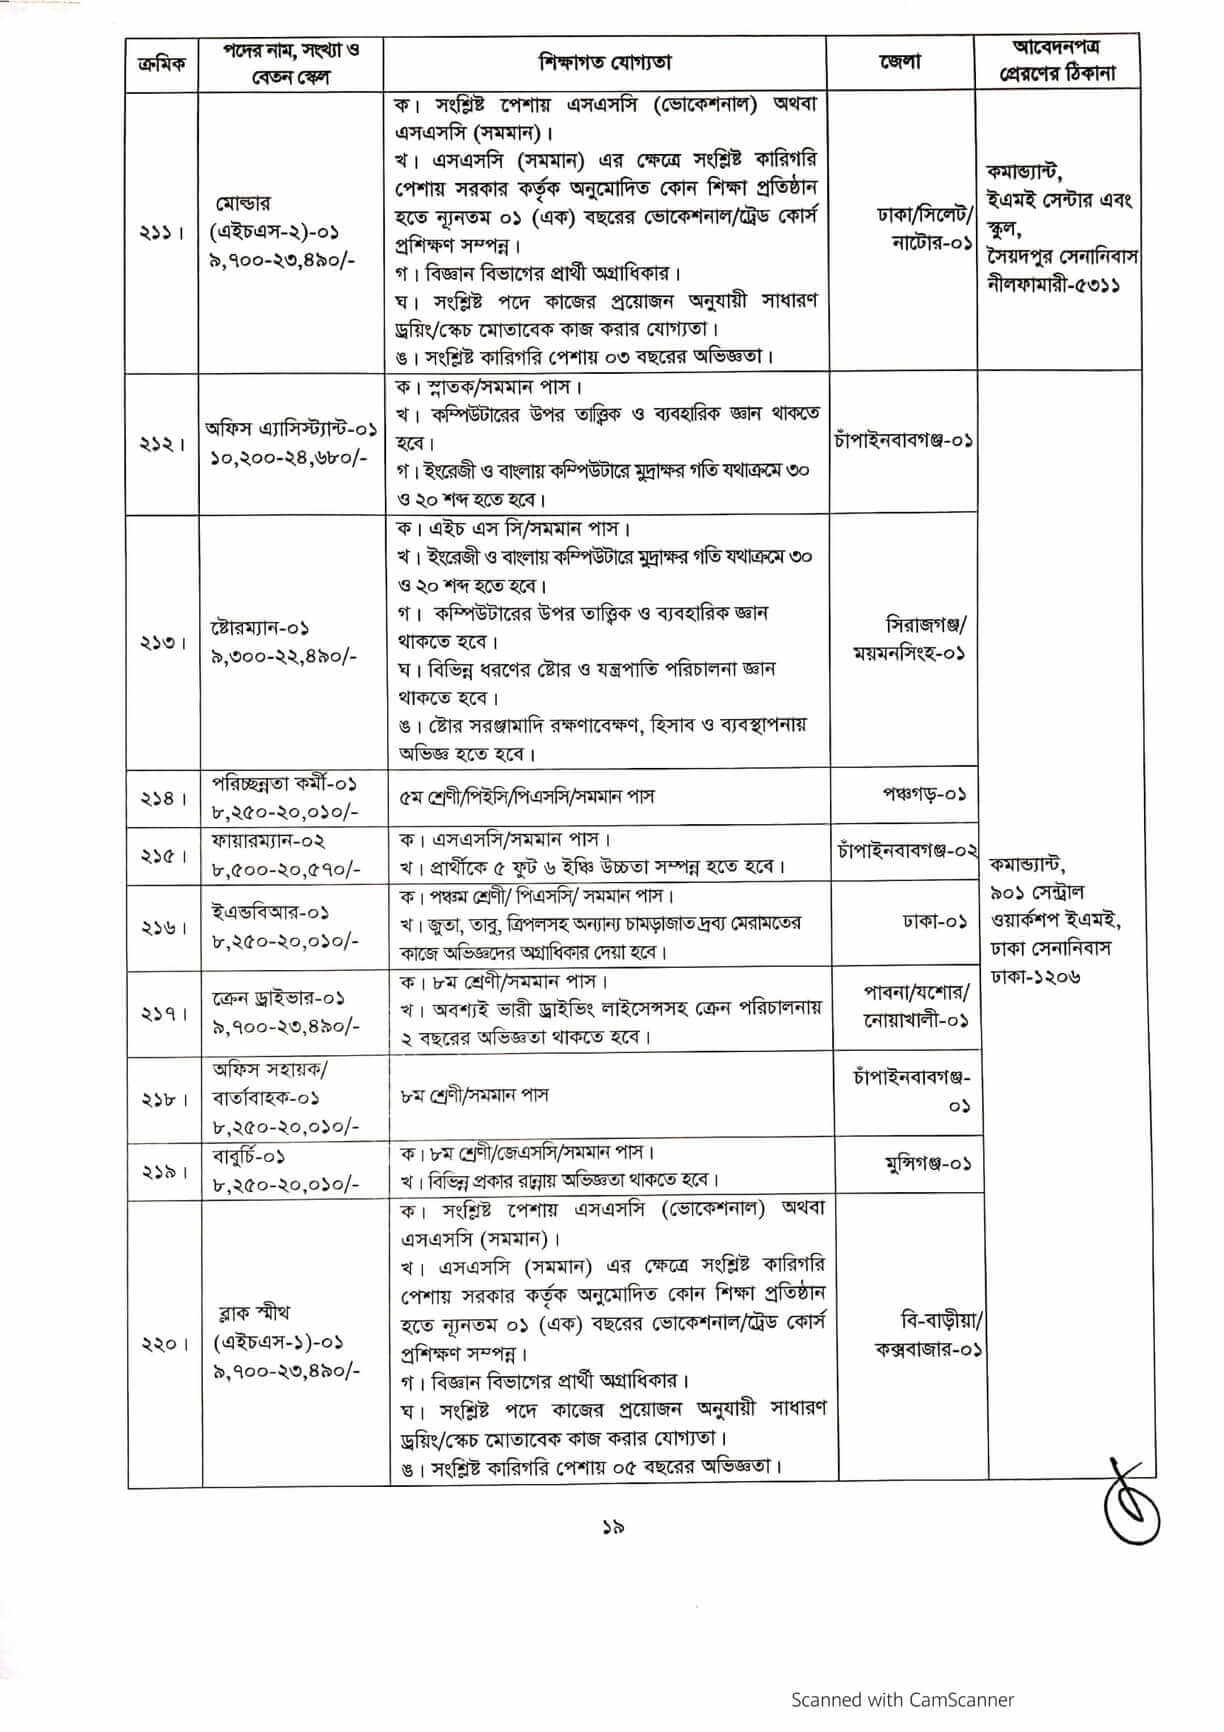 BD army civil job circular 2021